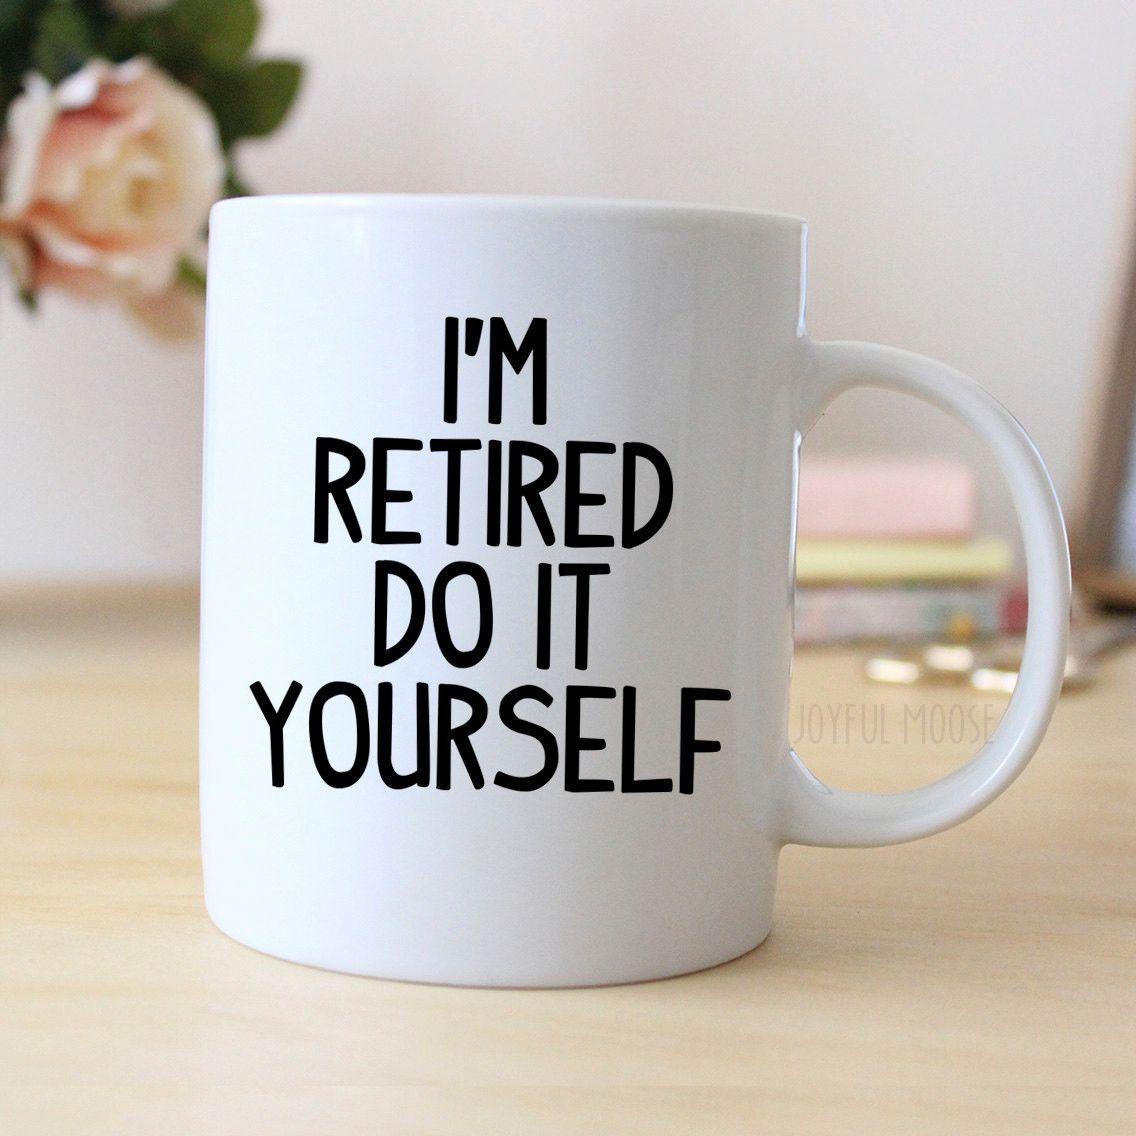 Retired coffee mug retirement gift coffee cup jubilacin coffee mug says im retired do it yourself great retirement gift solutioingenieria Gallery